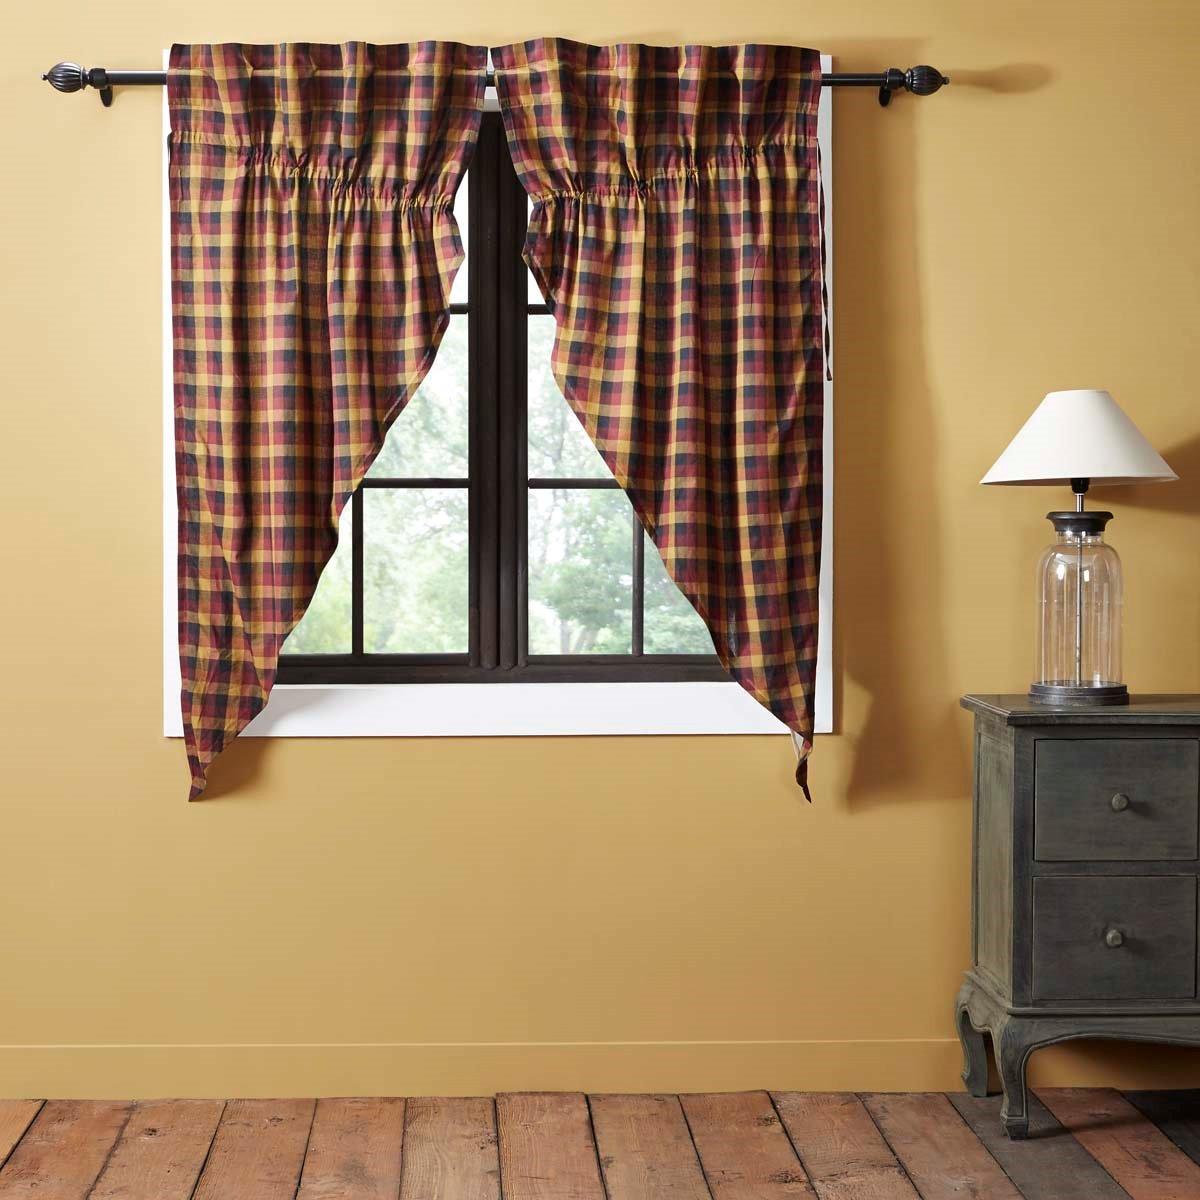 Primitive Check Prairie Curtain set of 2 (63L x 36W)